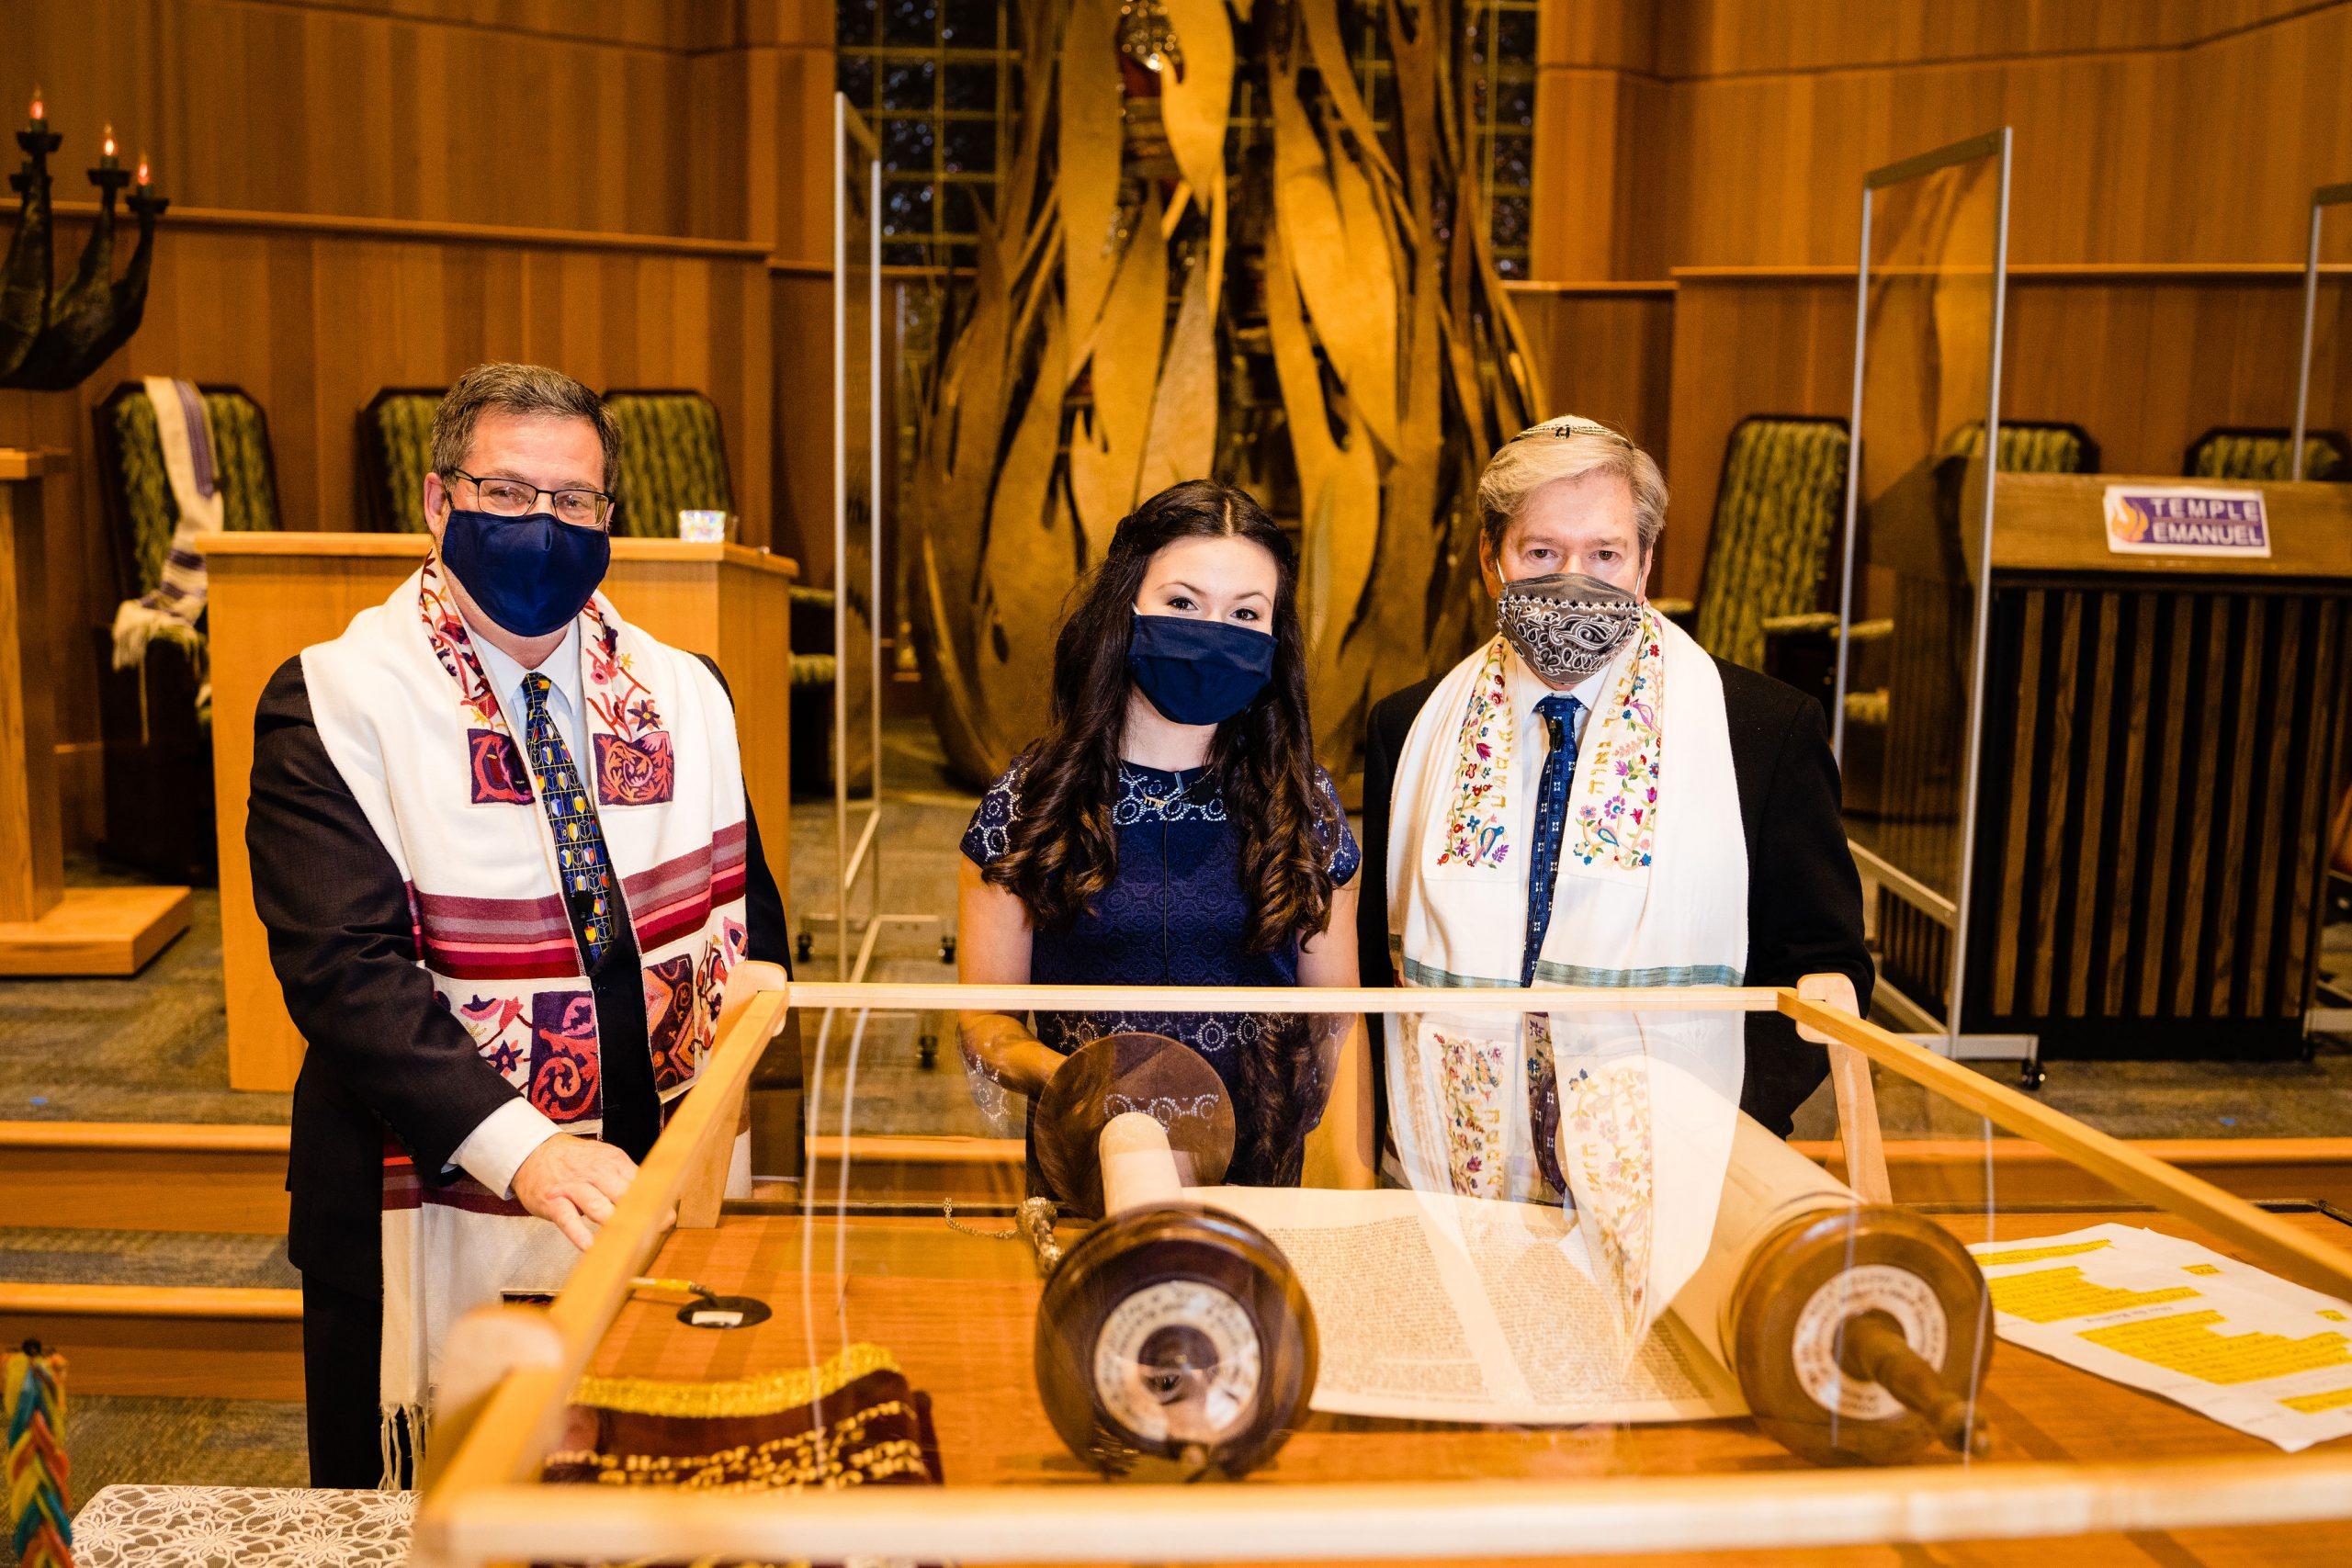 Synagogue New Jersey Bat mitzvah photography